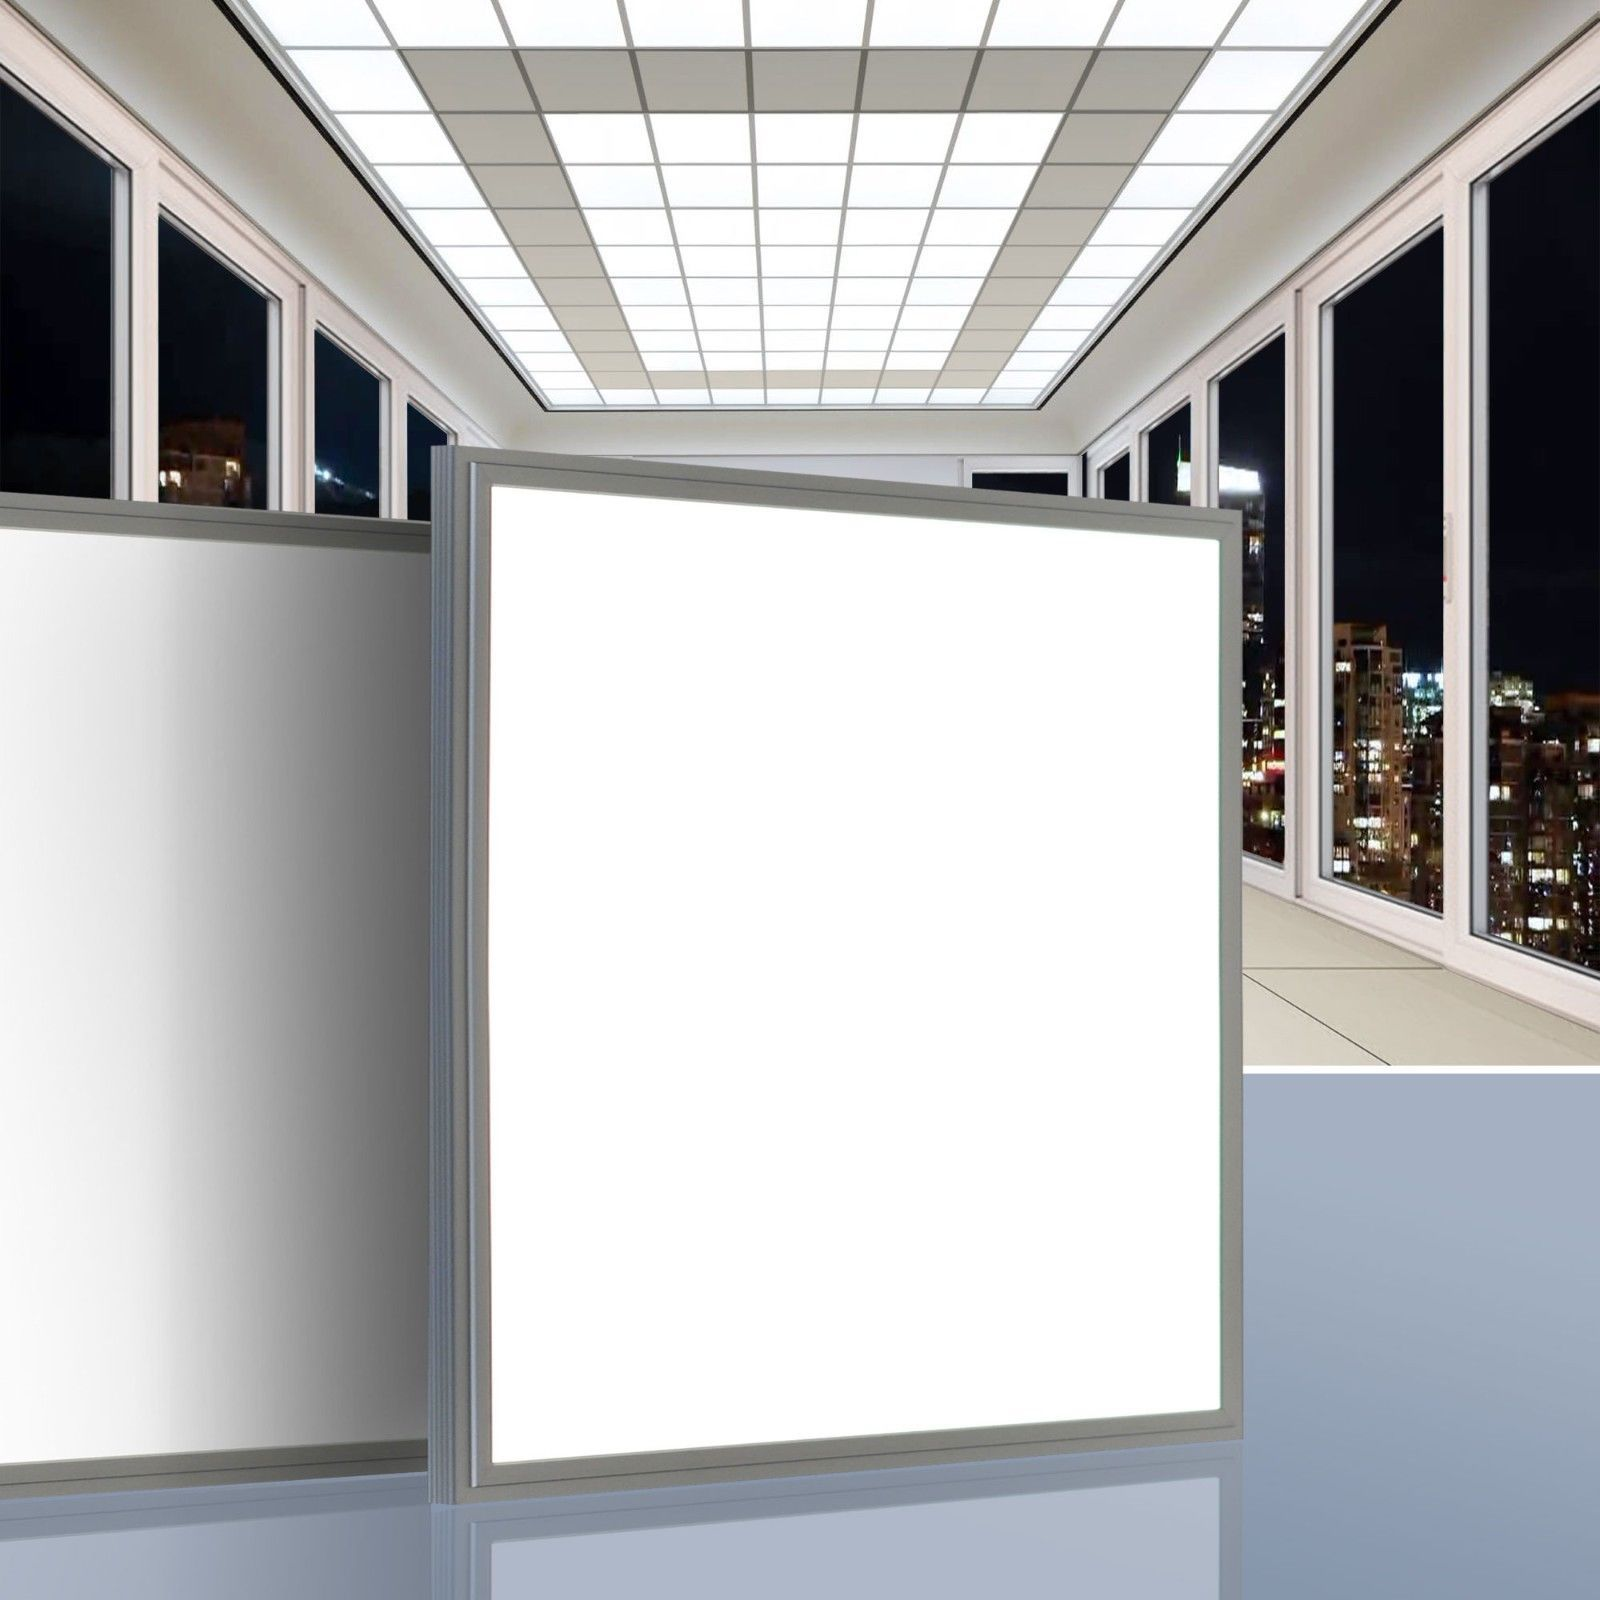 Details Zu Led Panel 45w Leuchte Lampe Einbau Deckenleuchte 62x62cm Einbauleuchte Ultraslim Einbauleuchten Led Panel Lampen